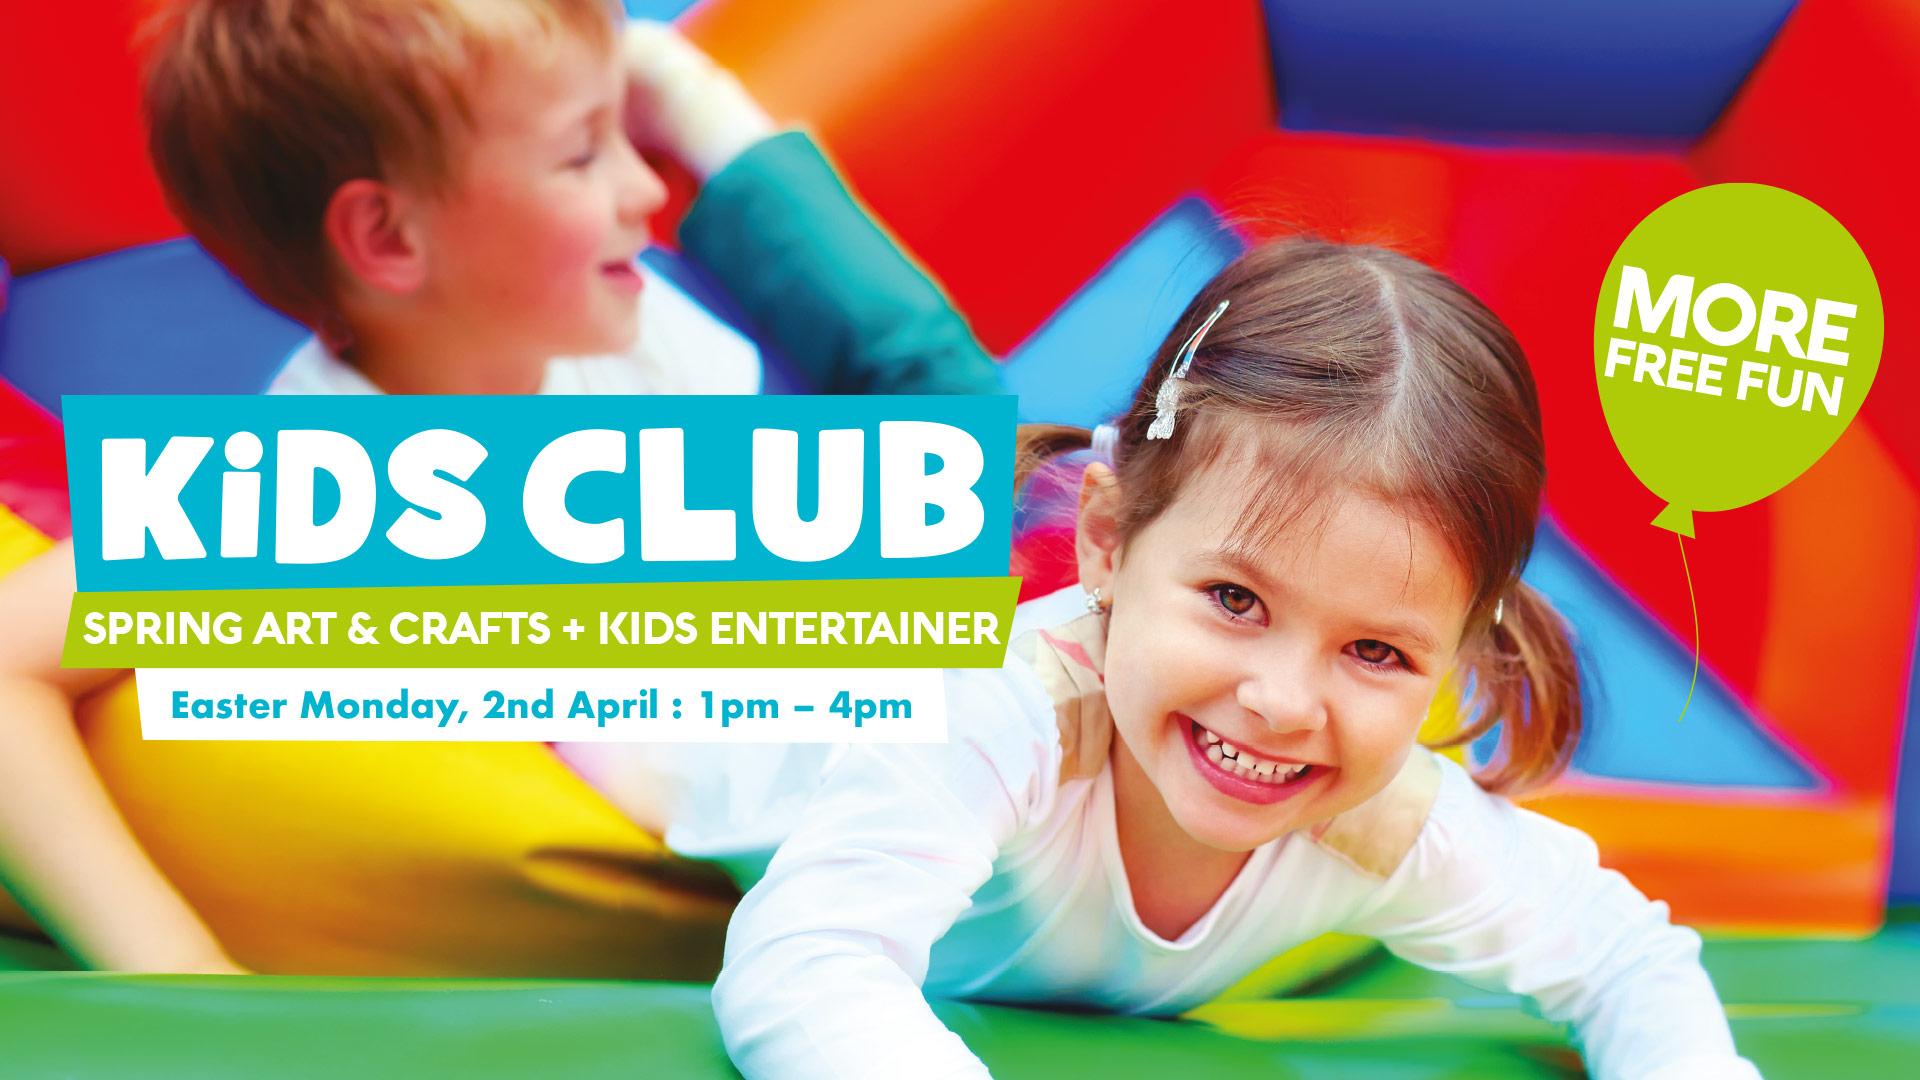 11185 CWest Kids Club Facebook Event Cover 1920x1080 26.03.18